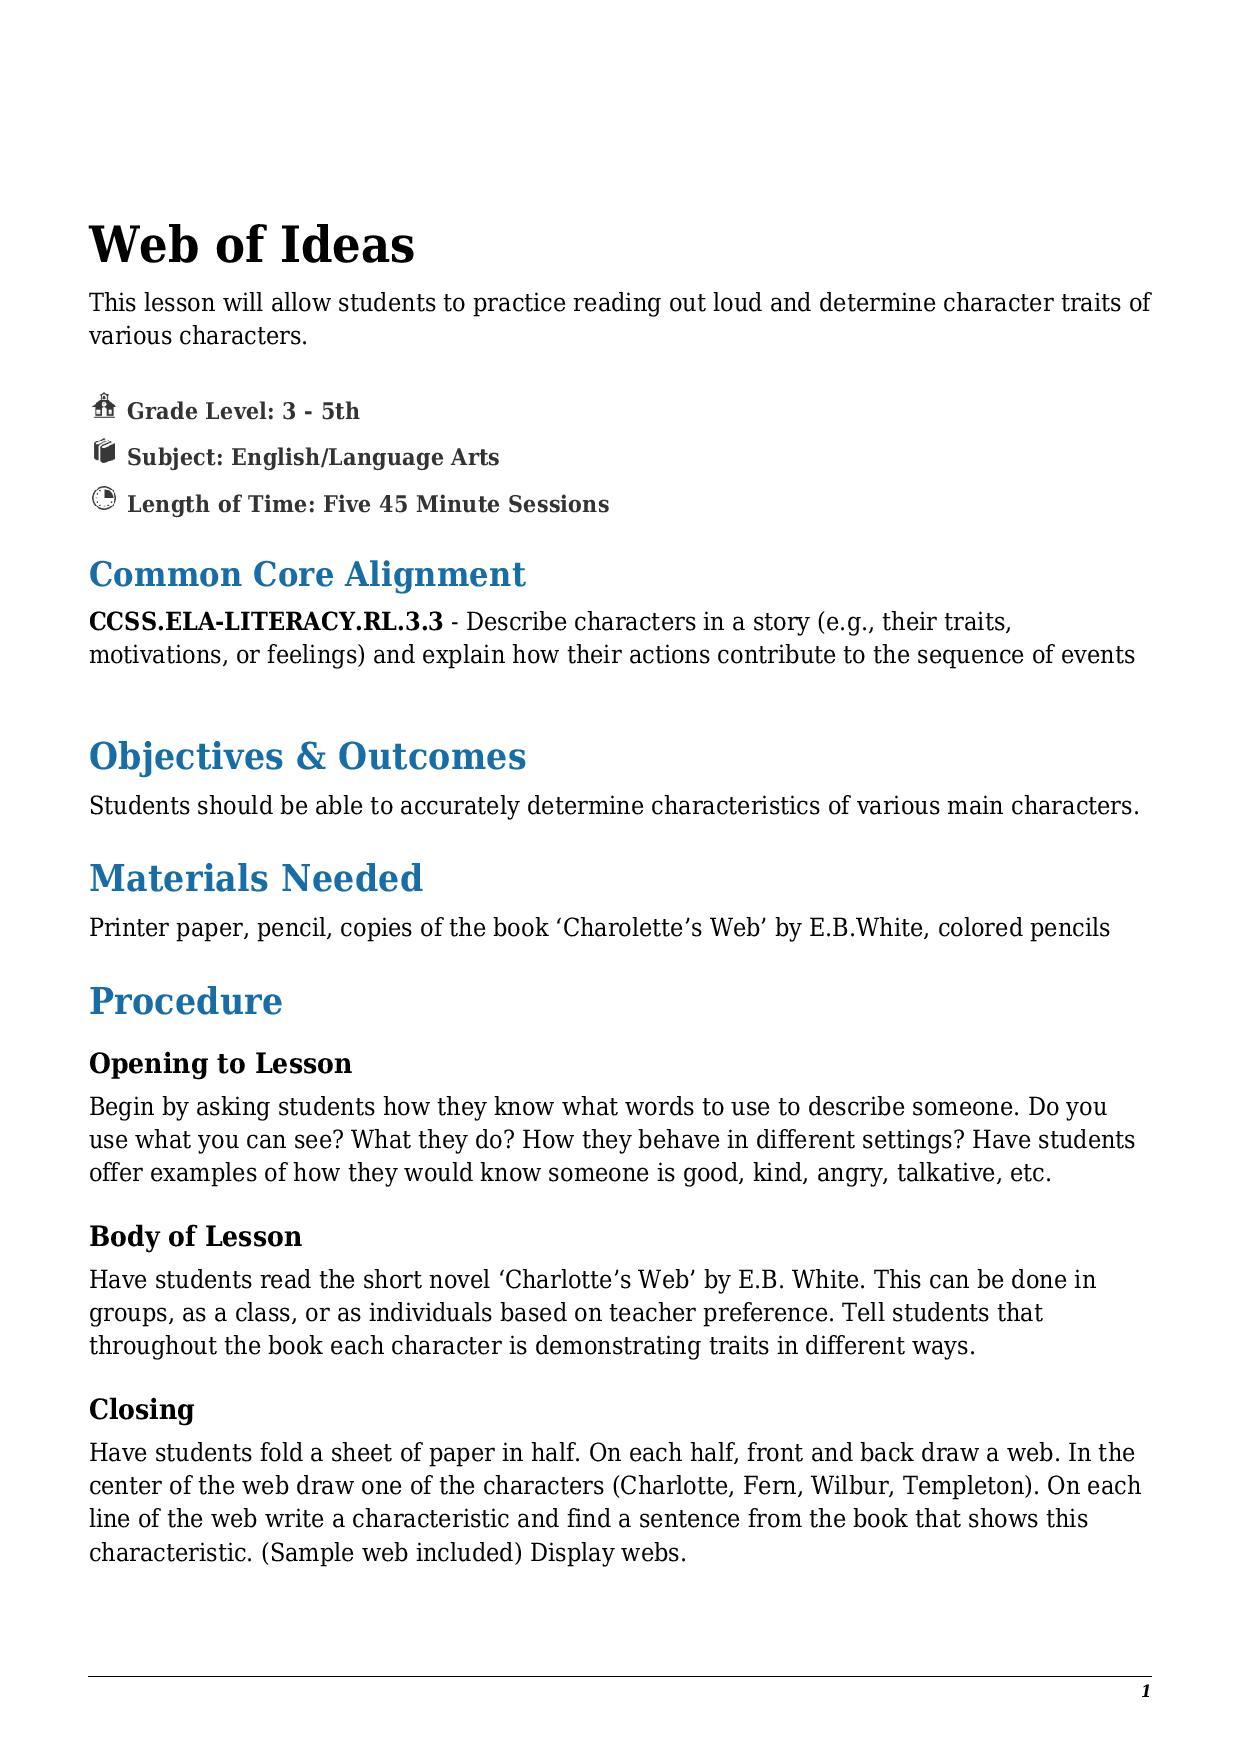 hight resolution of Web of Ideas Grade 3 - 5th - Lesson Tutor